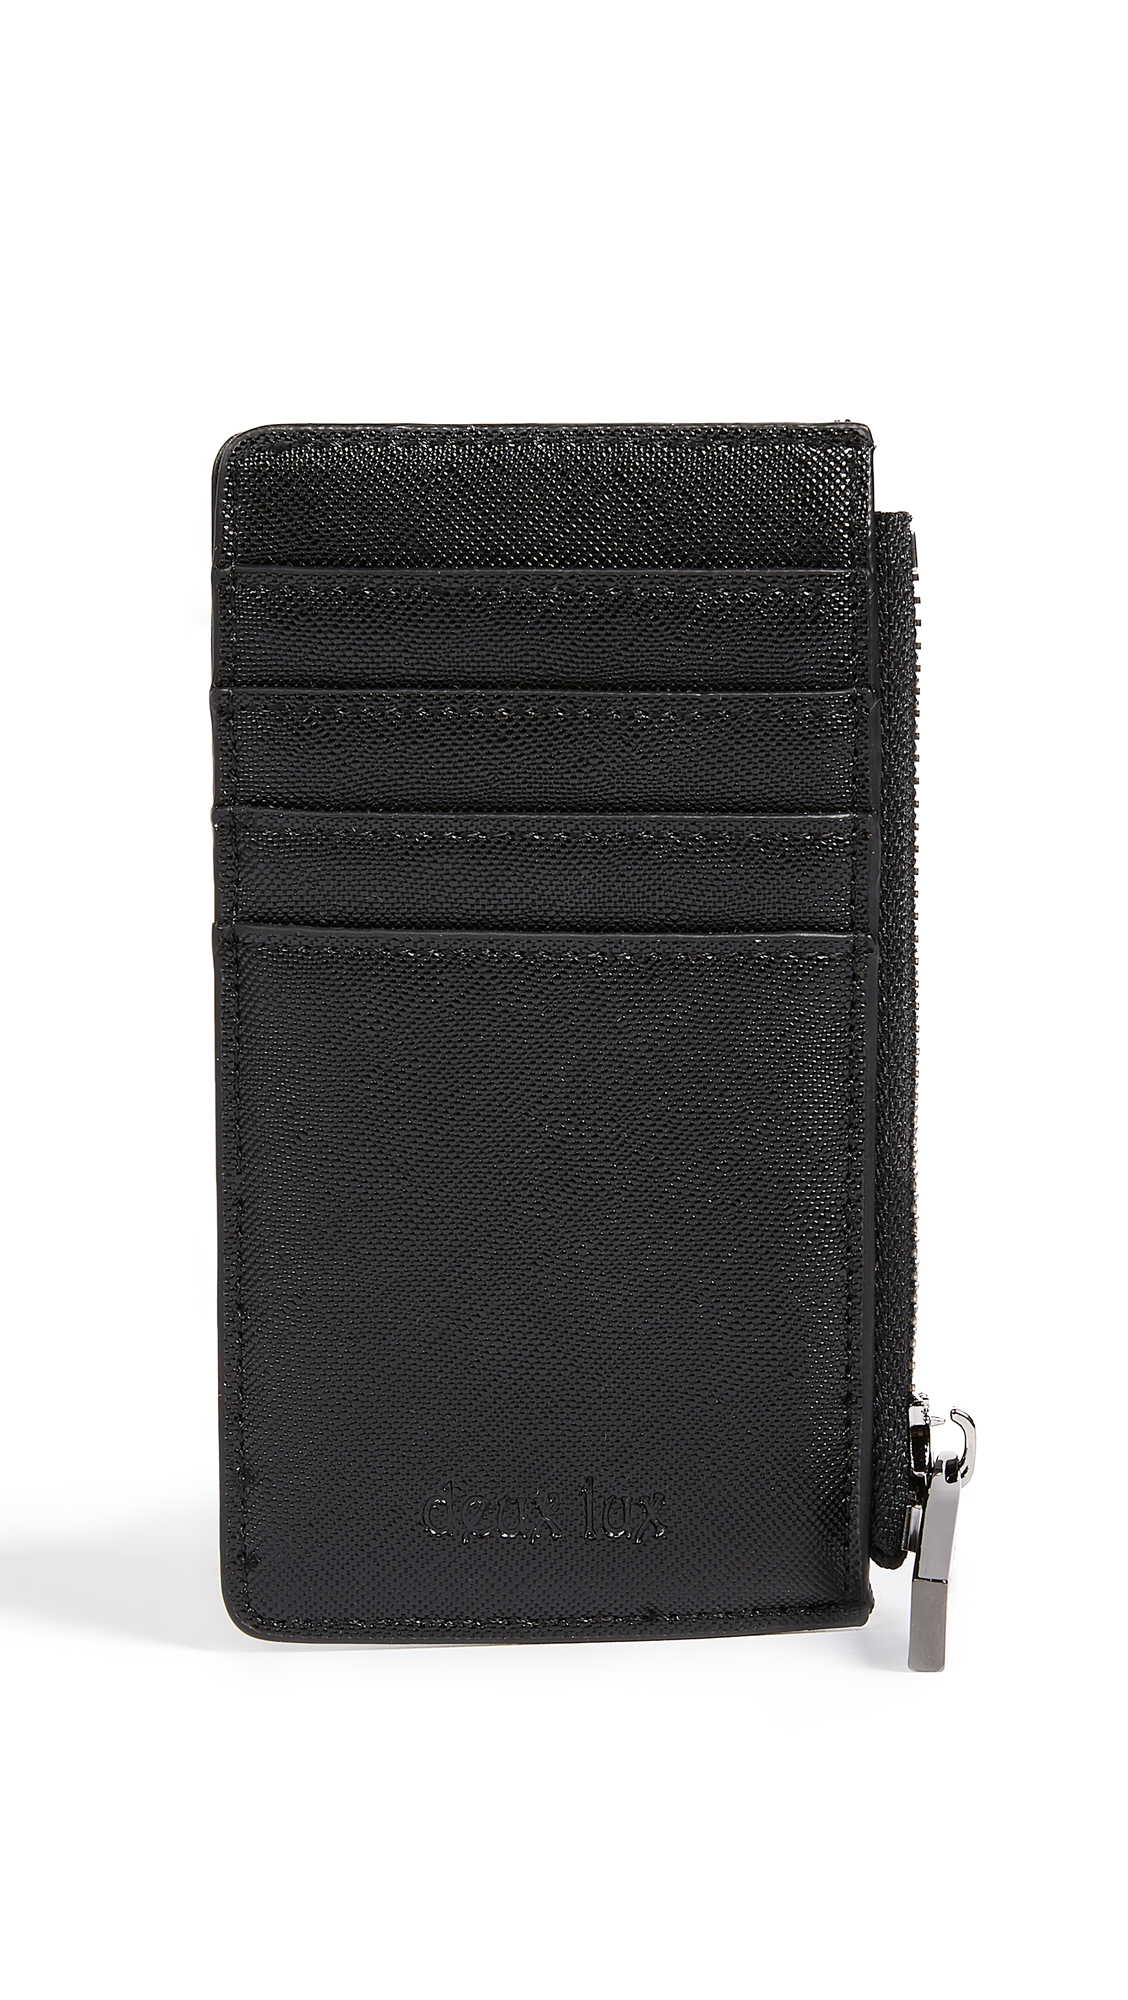 Deux Lux Rose Card Case - Black